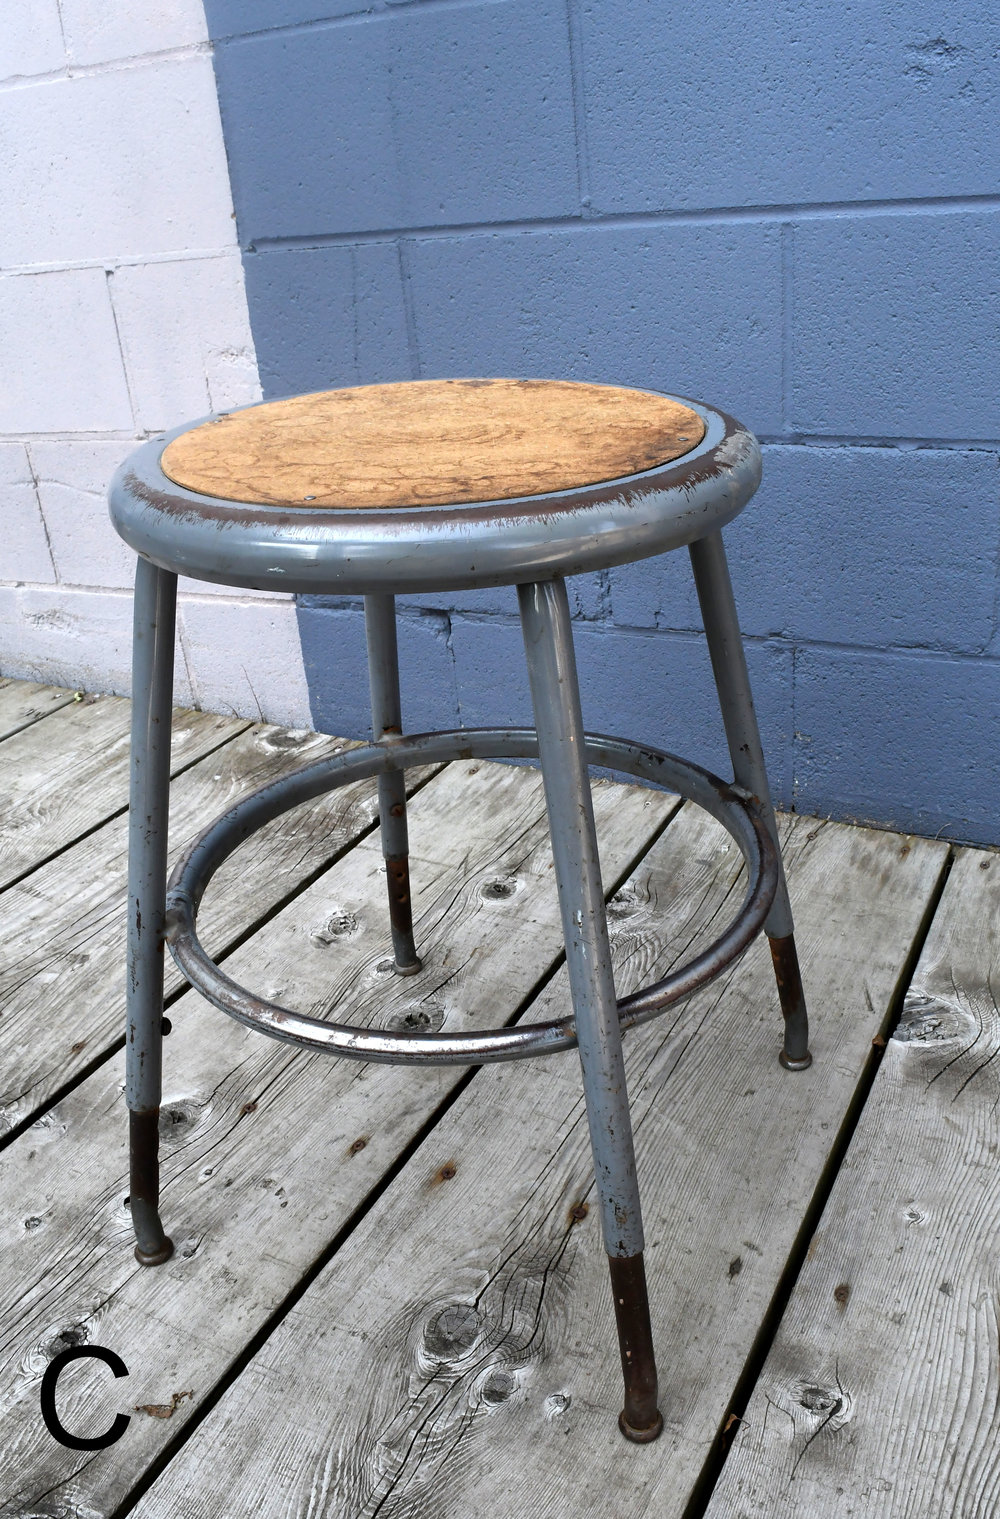 47340-art-school-stools-variation-C-with-letter.jpg